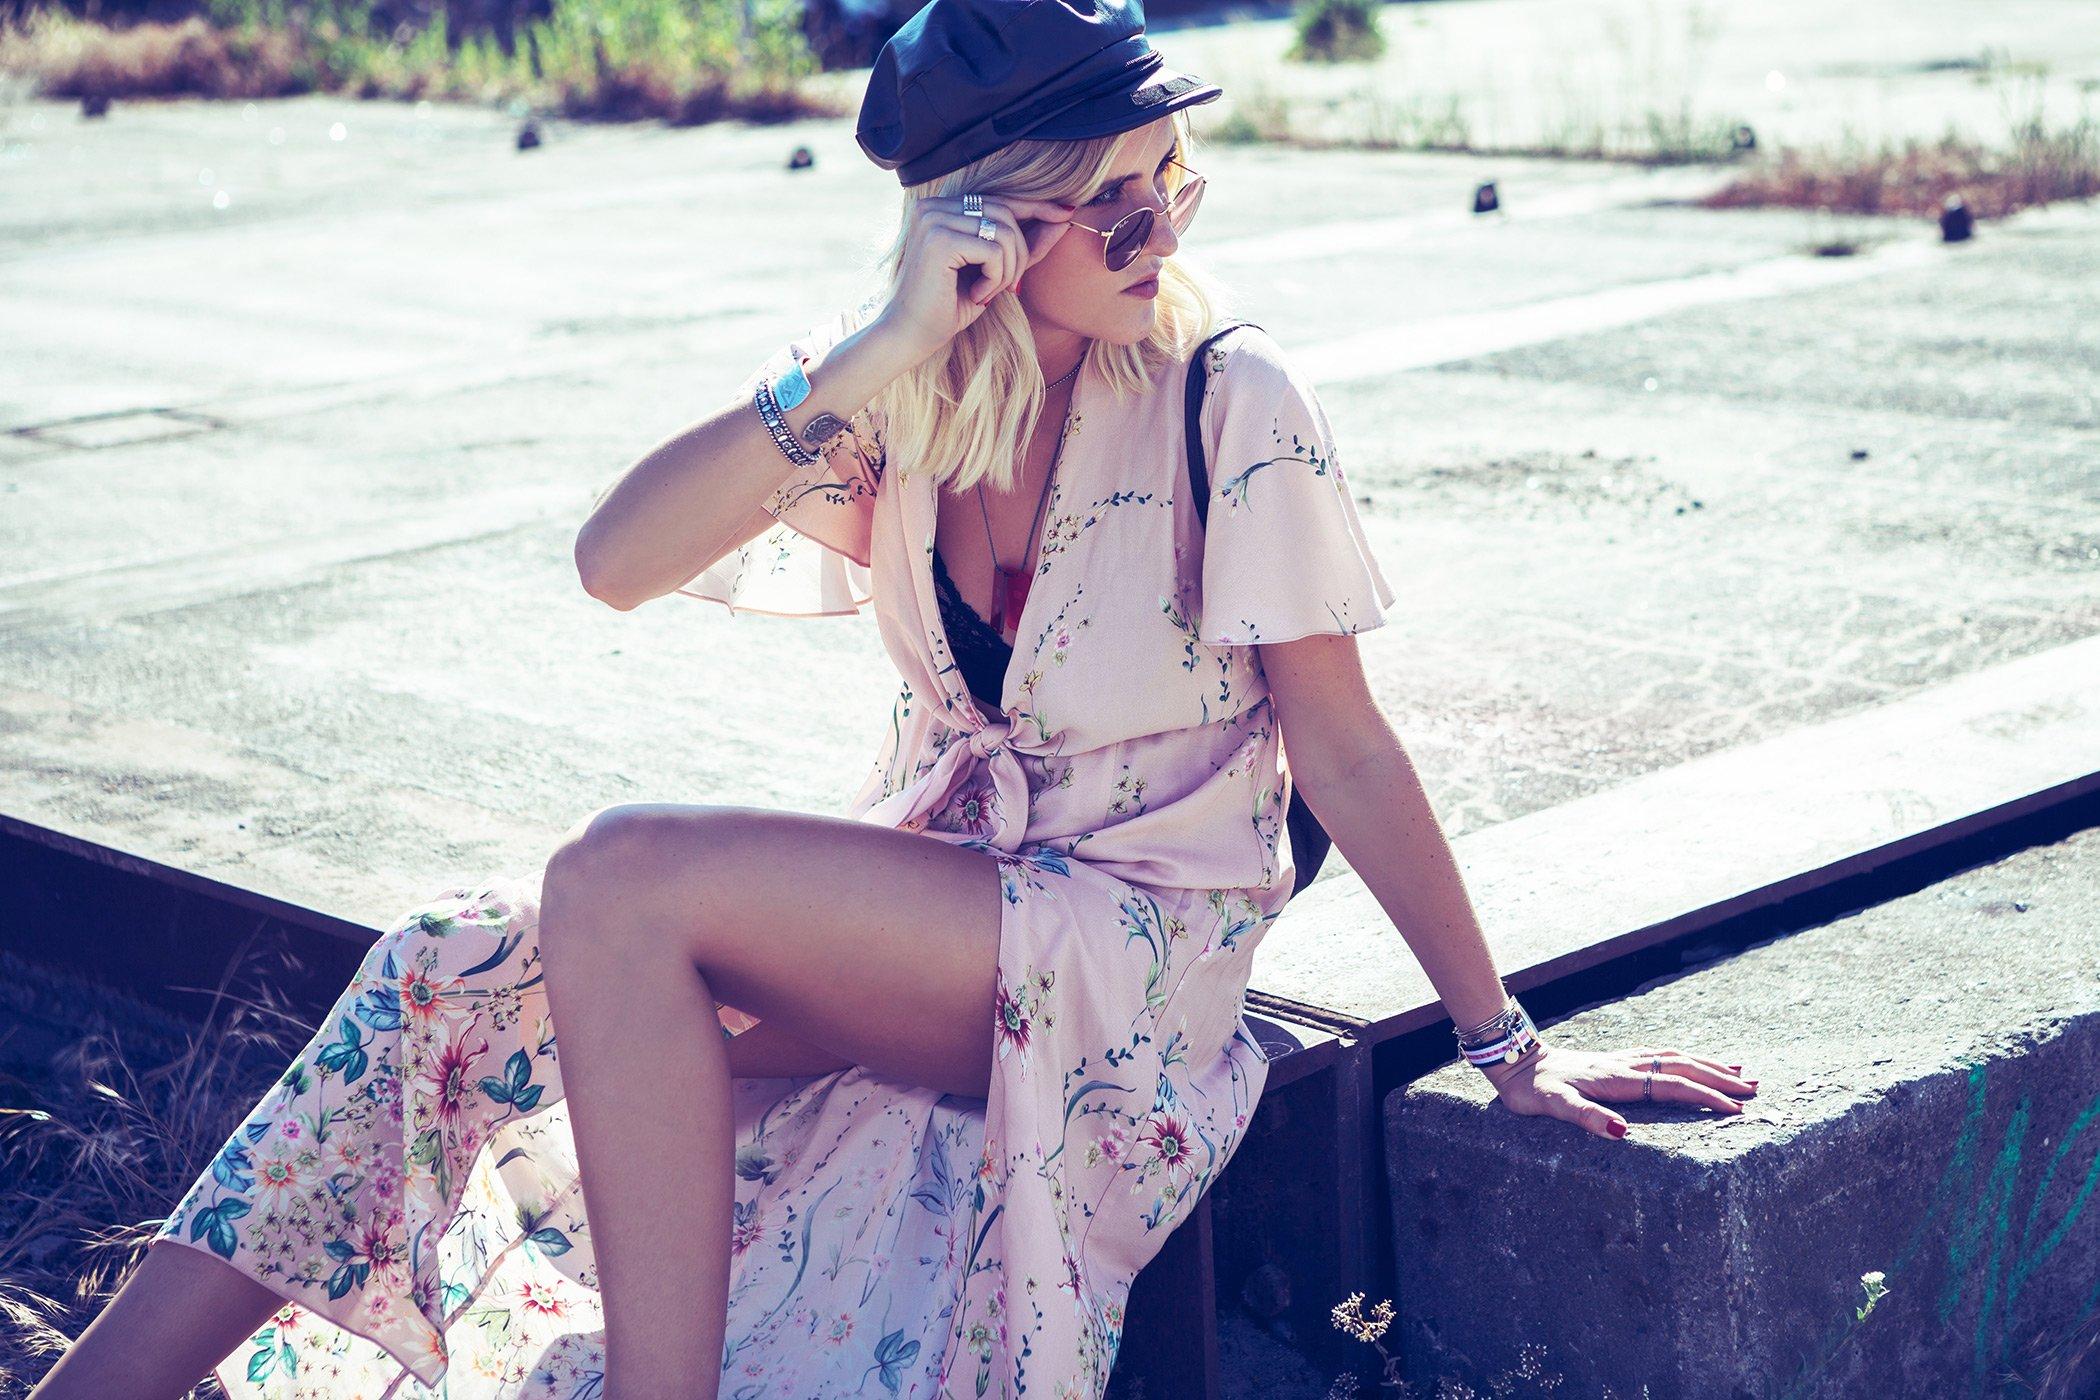 explorer-in-a-pink-dress-4